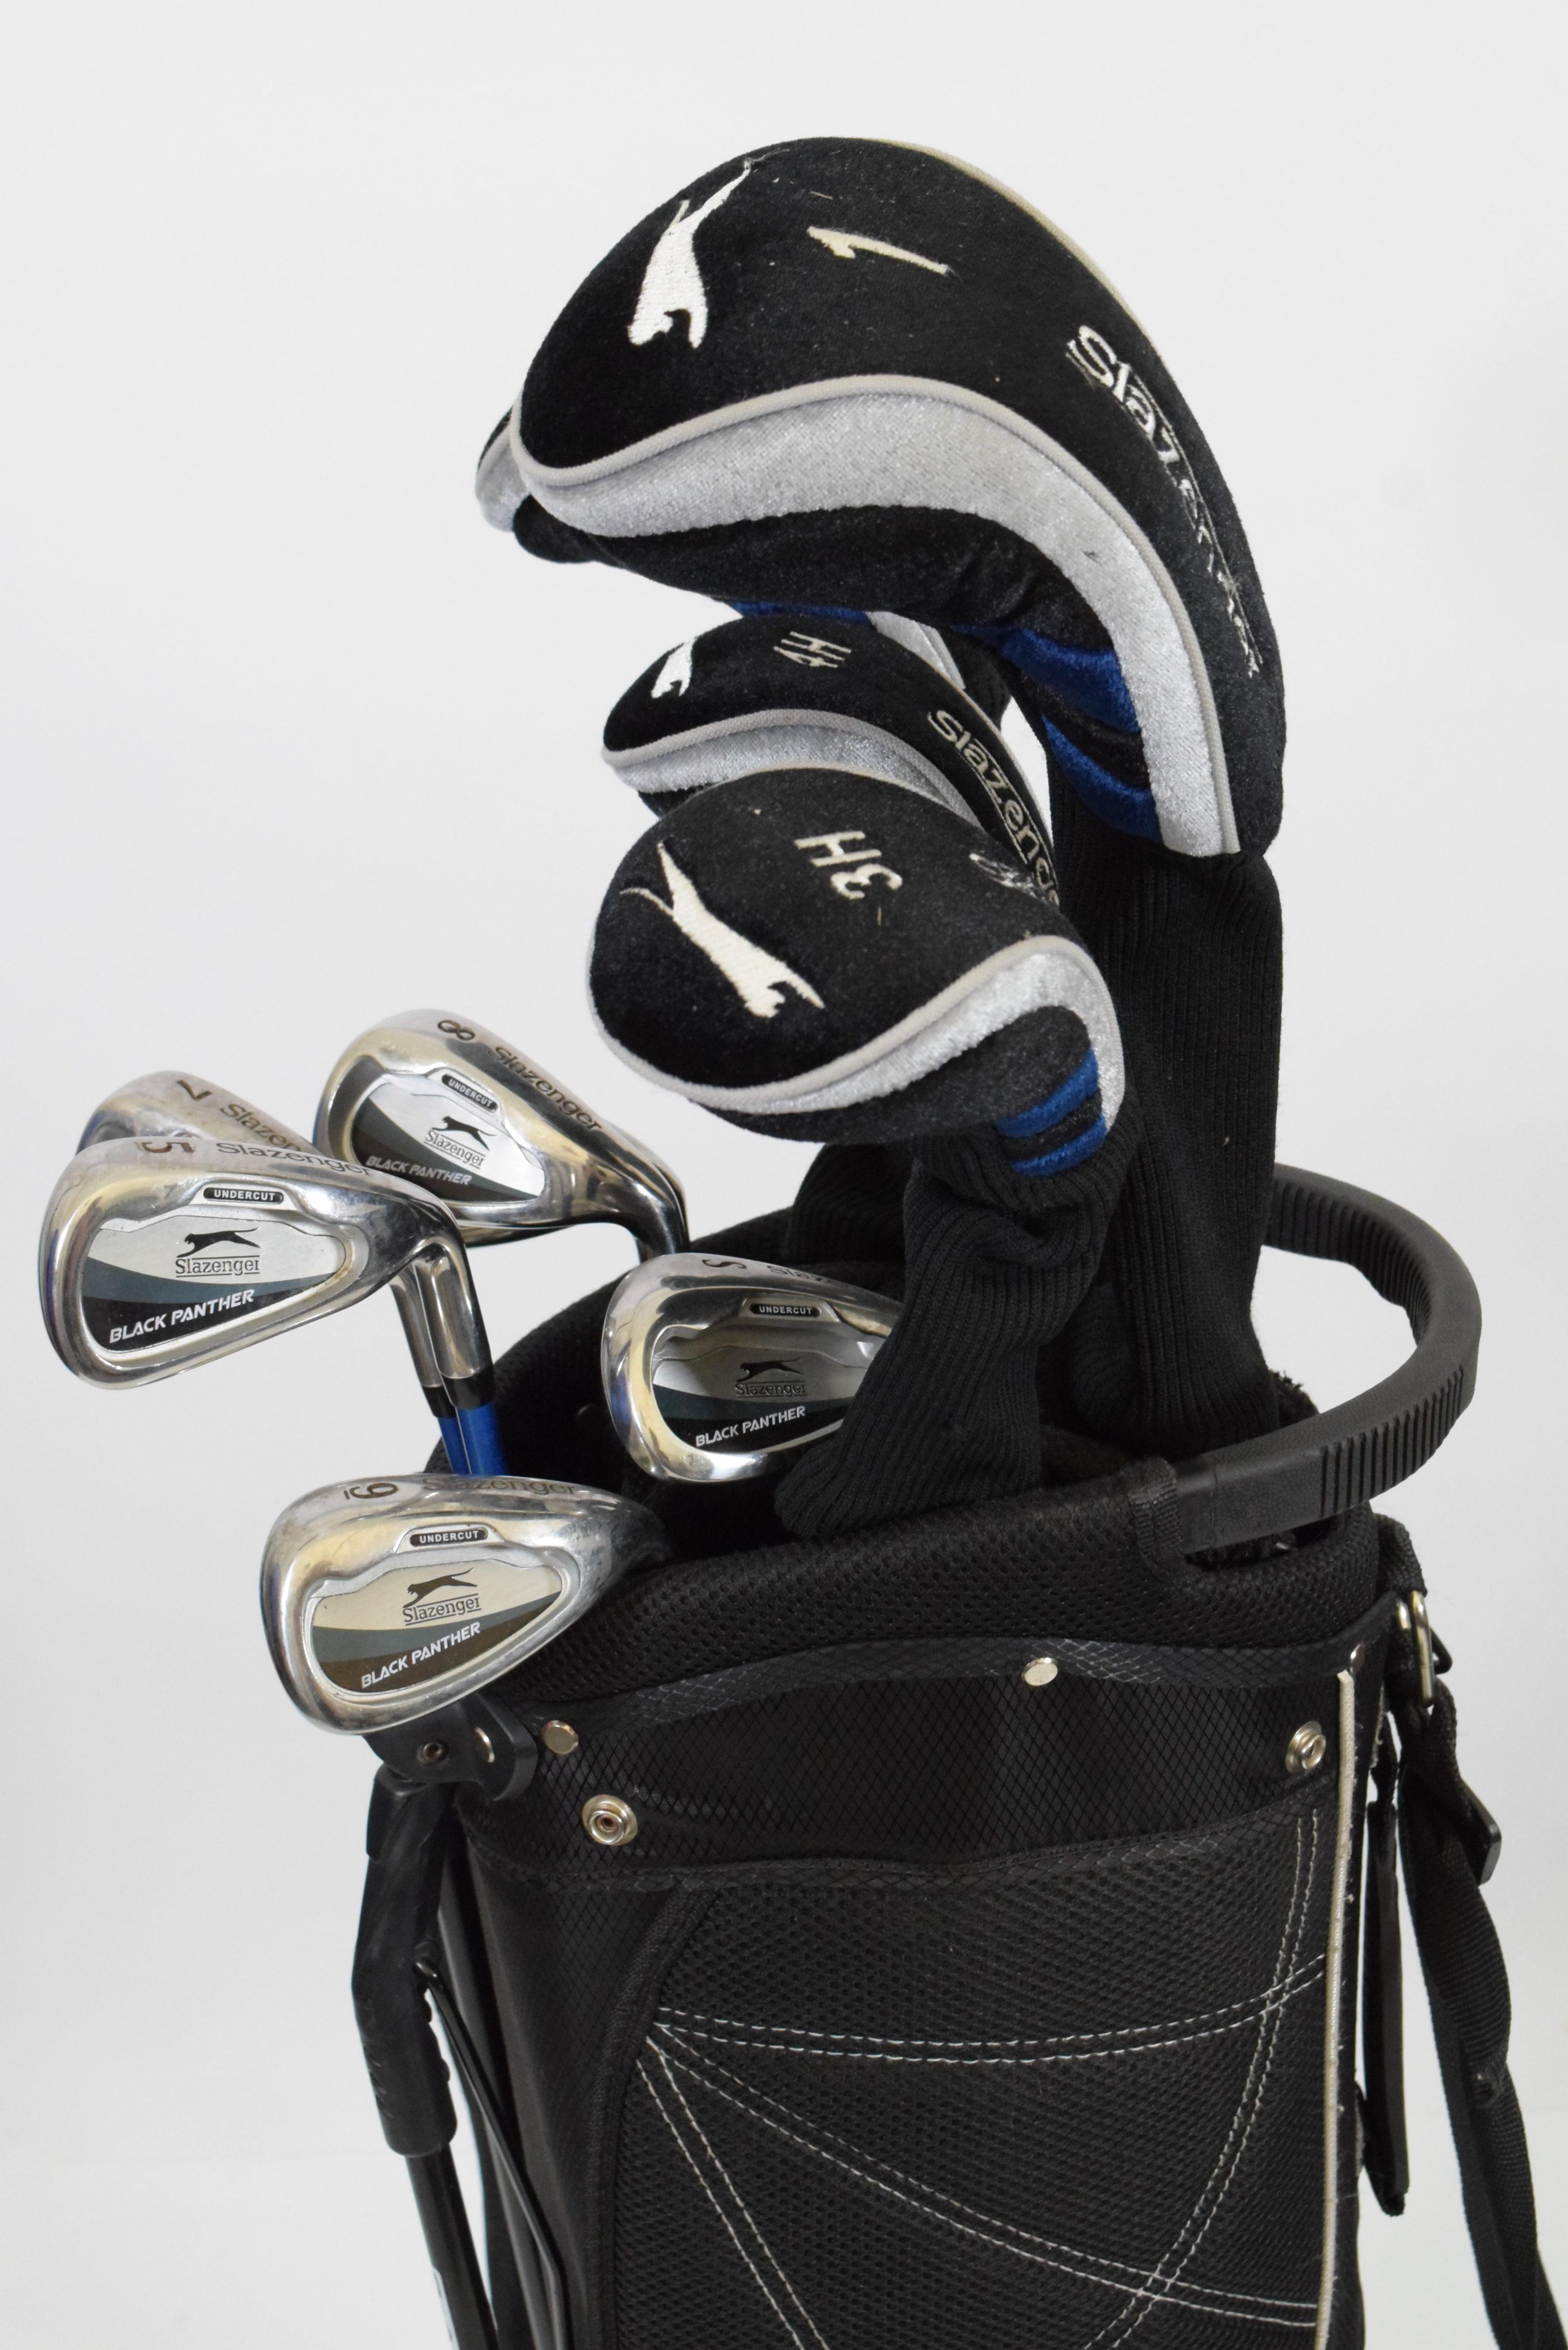 5b60dbe079a SLAZENGER PACKAGE SET / BLACK / WOODS, IRONS BAG / SLPBLA001 - Golf ...